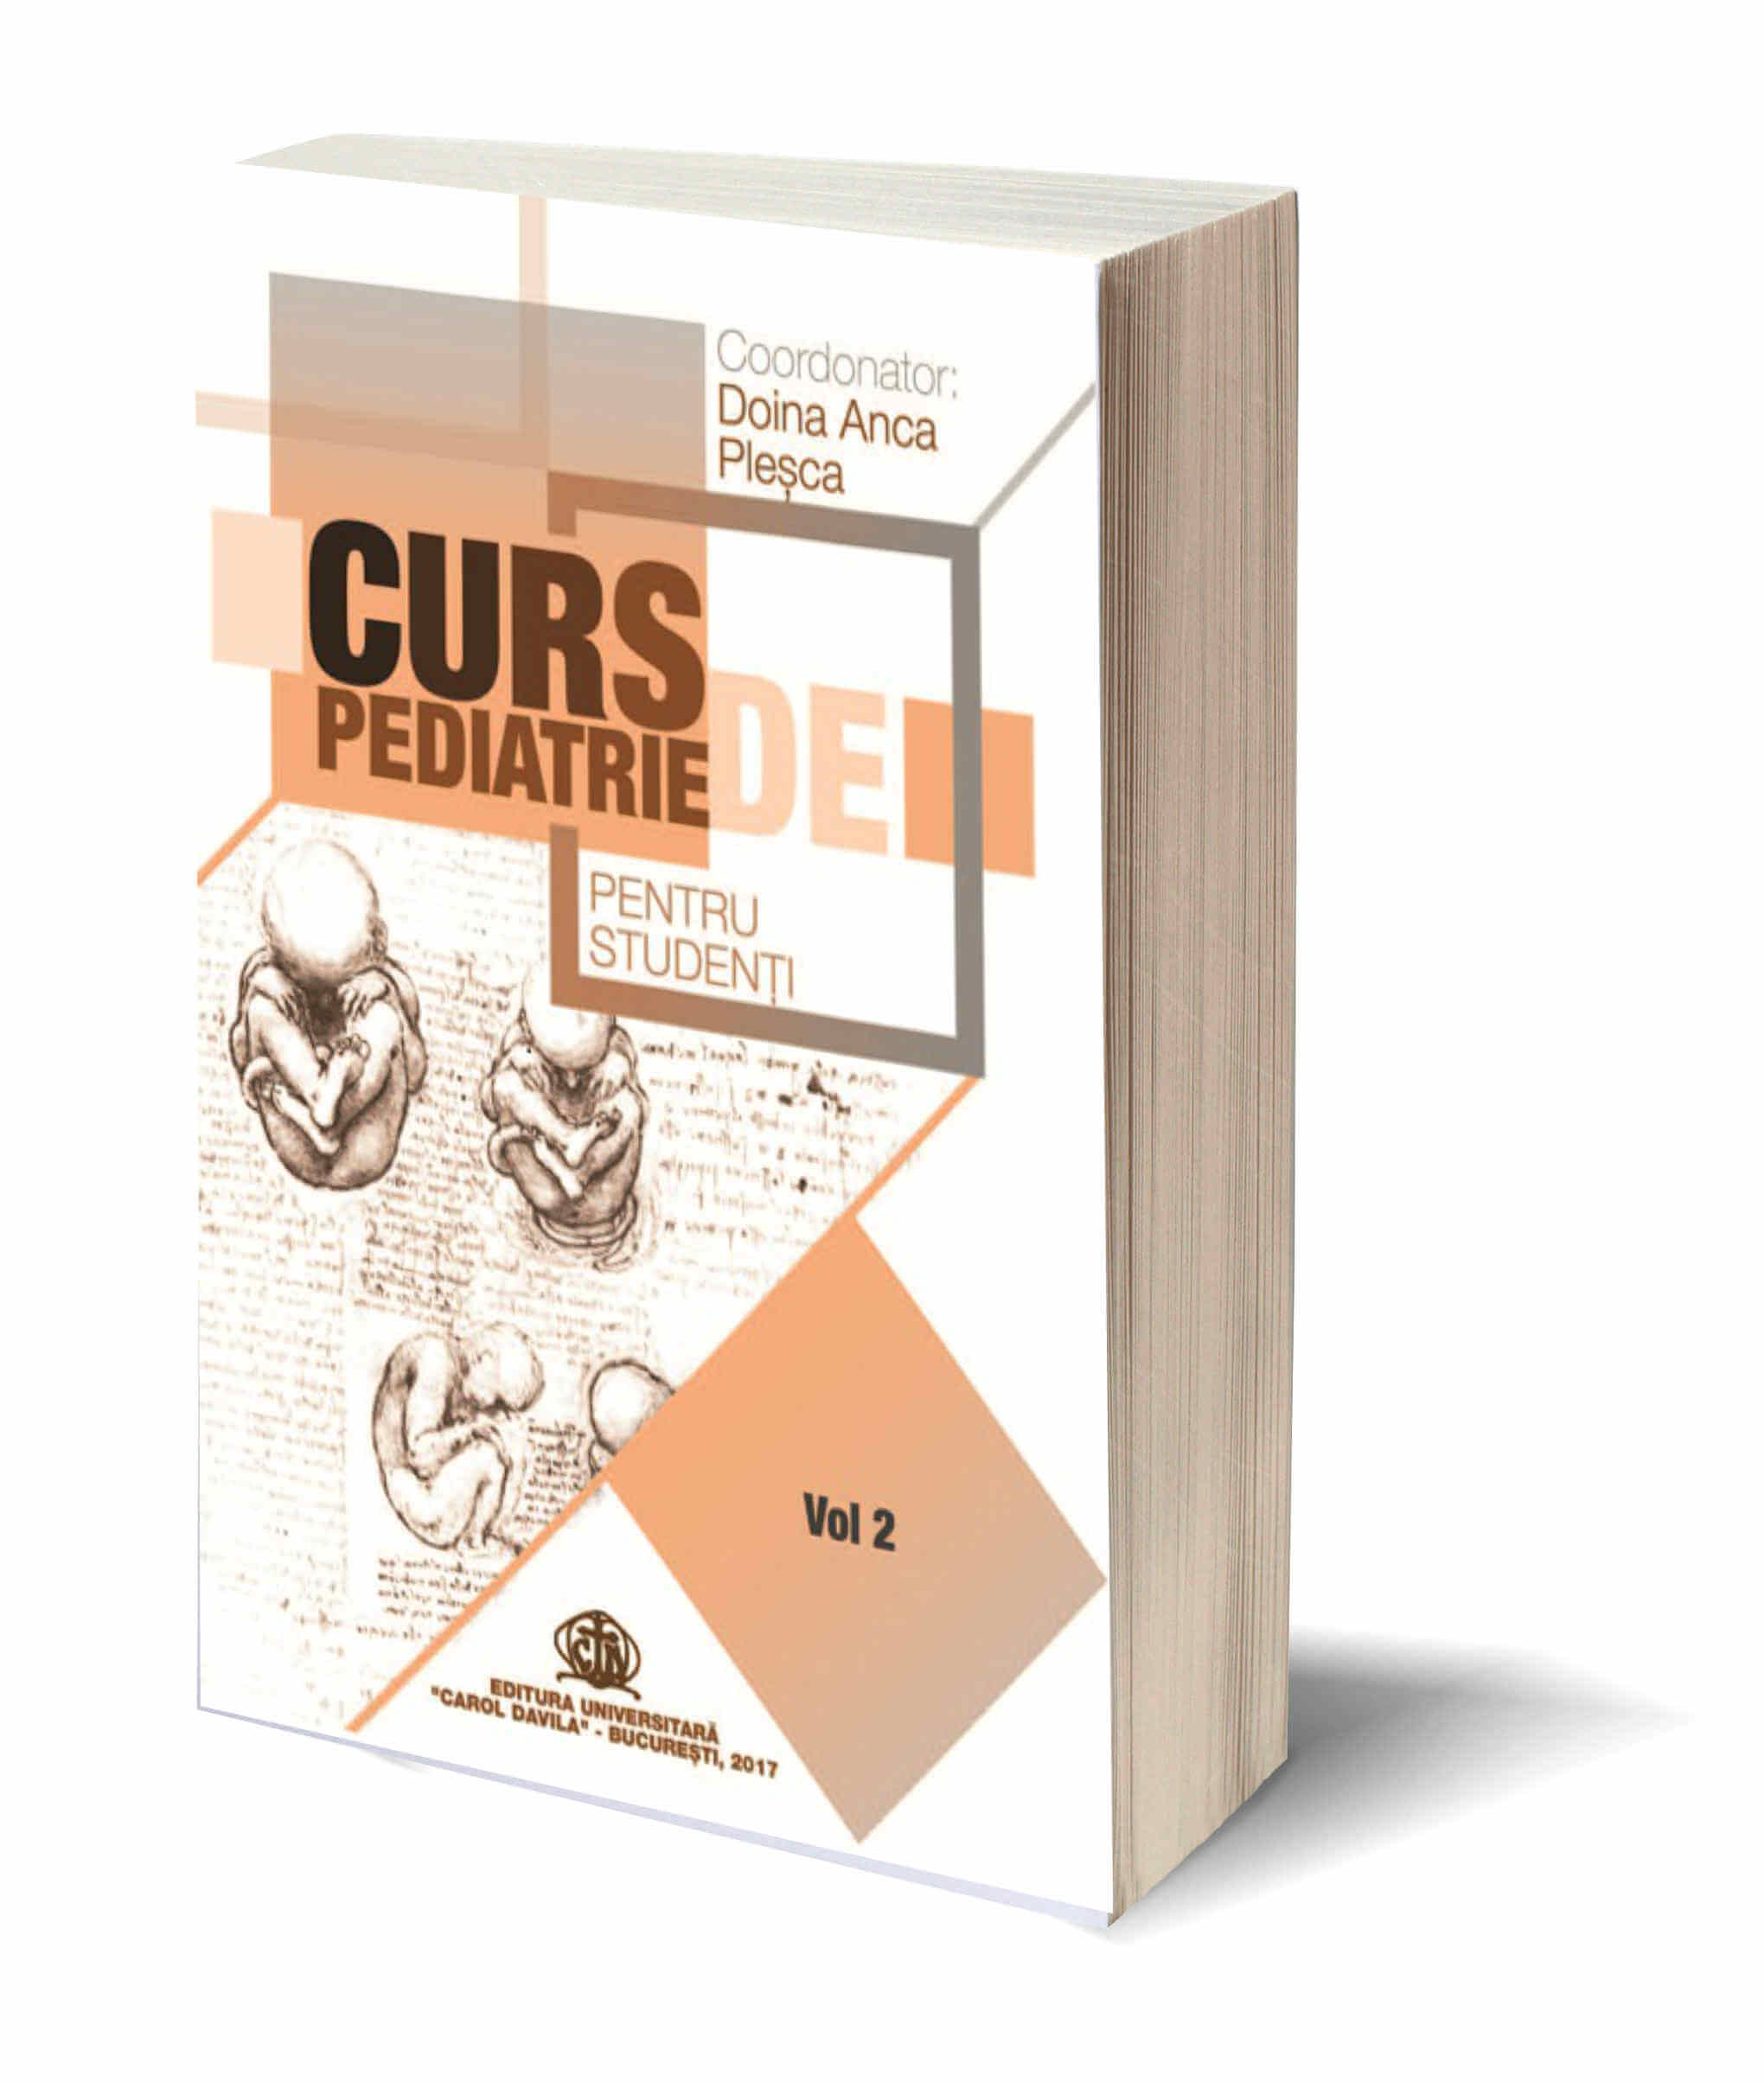 Curs de Pediatrie pentru studenti Vol. 2